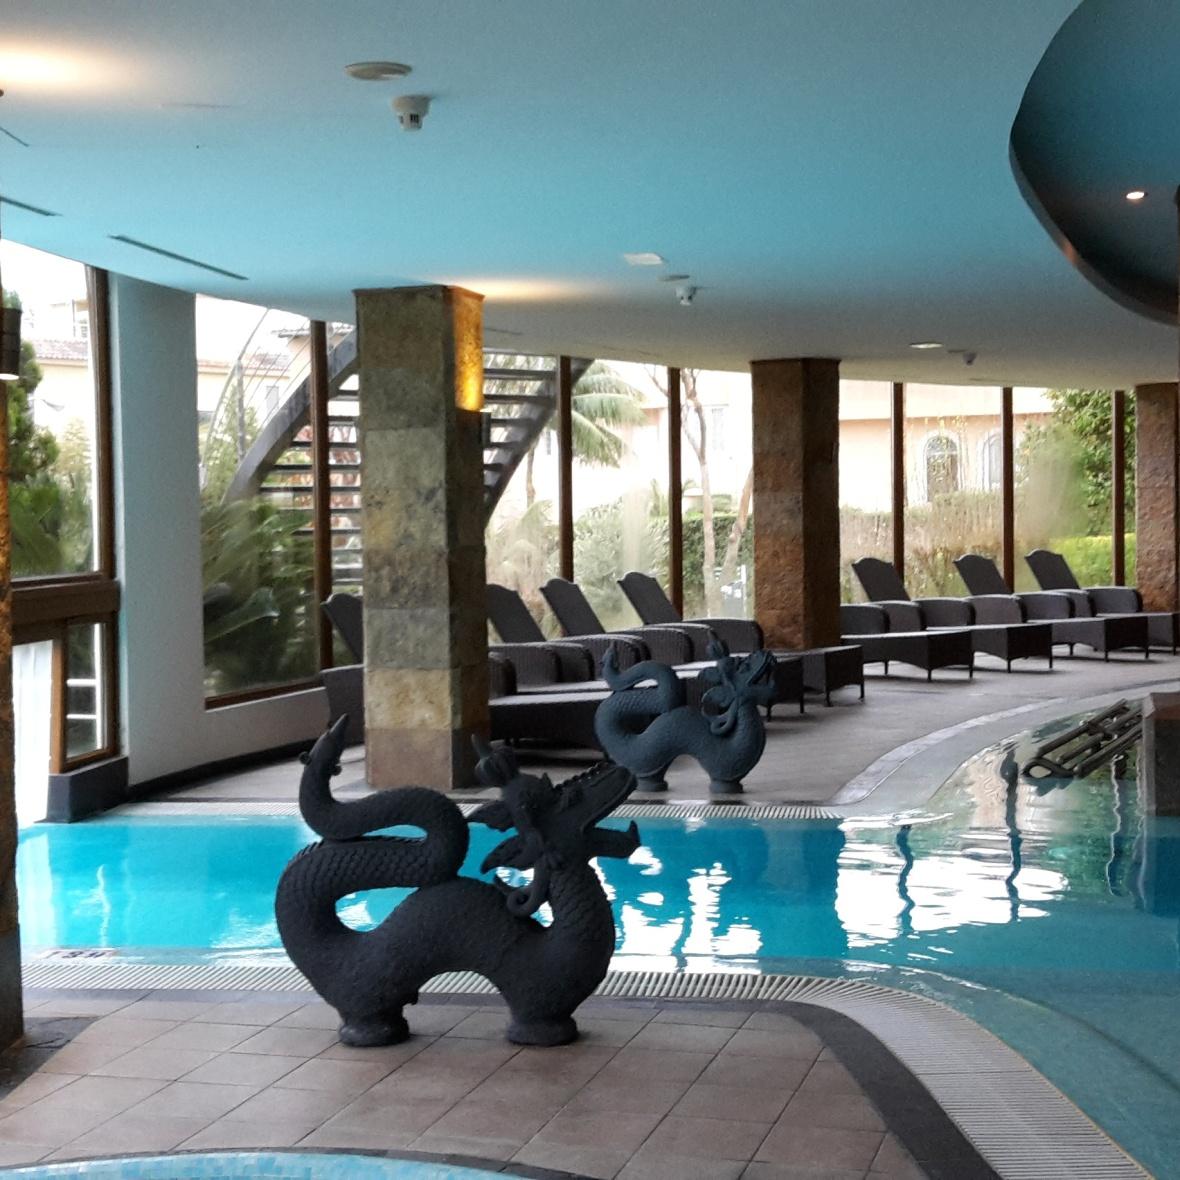 Valparaiso Spa indoor pool